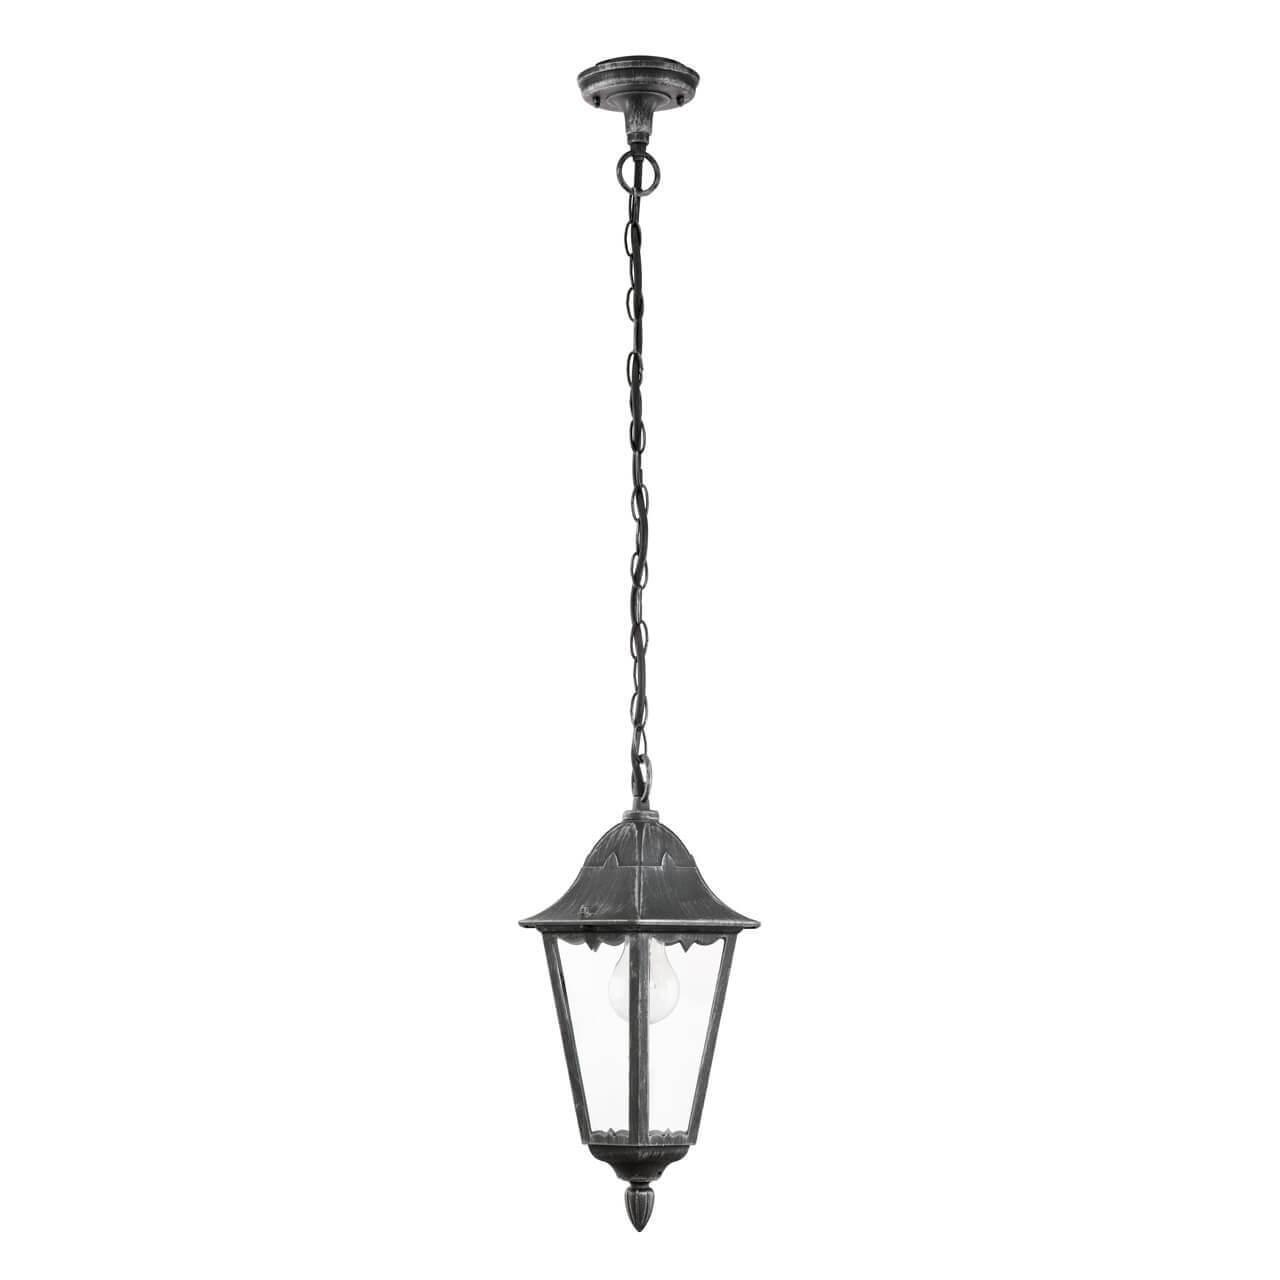 Уличный светильник Eglo 93455, E27 цена